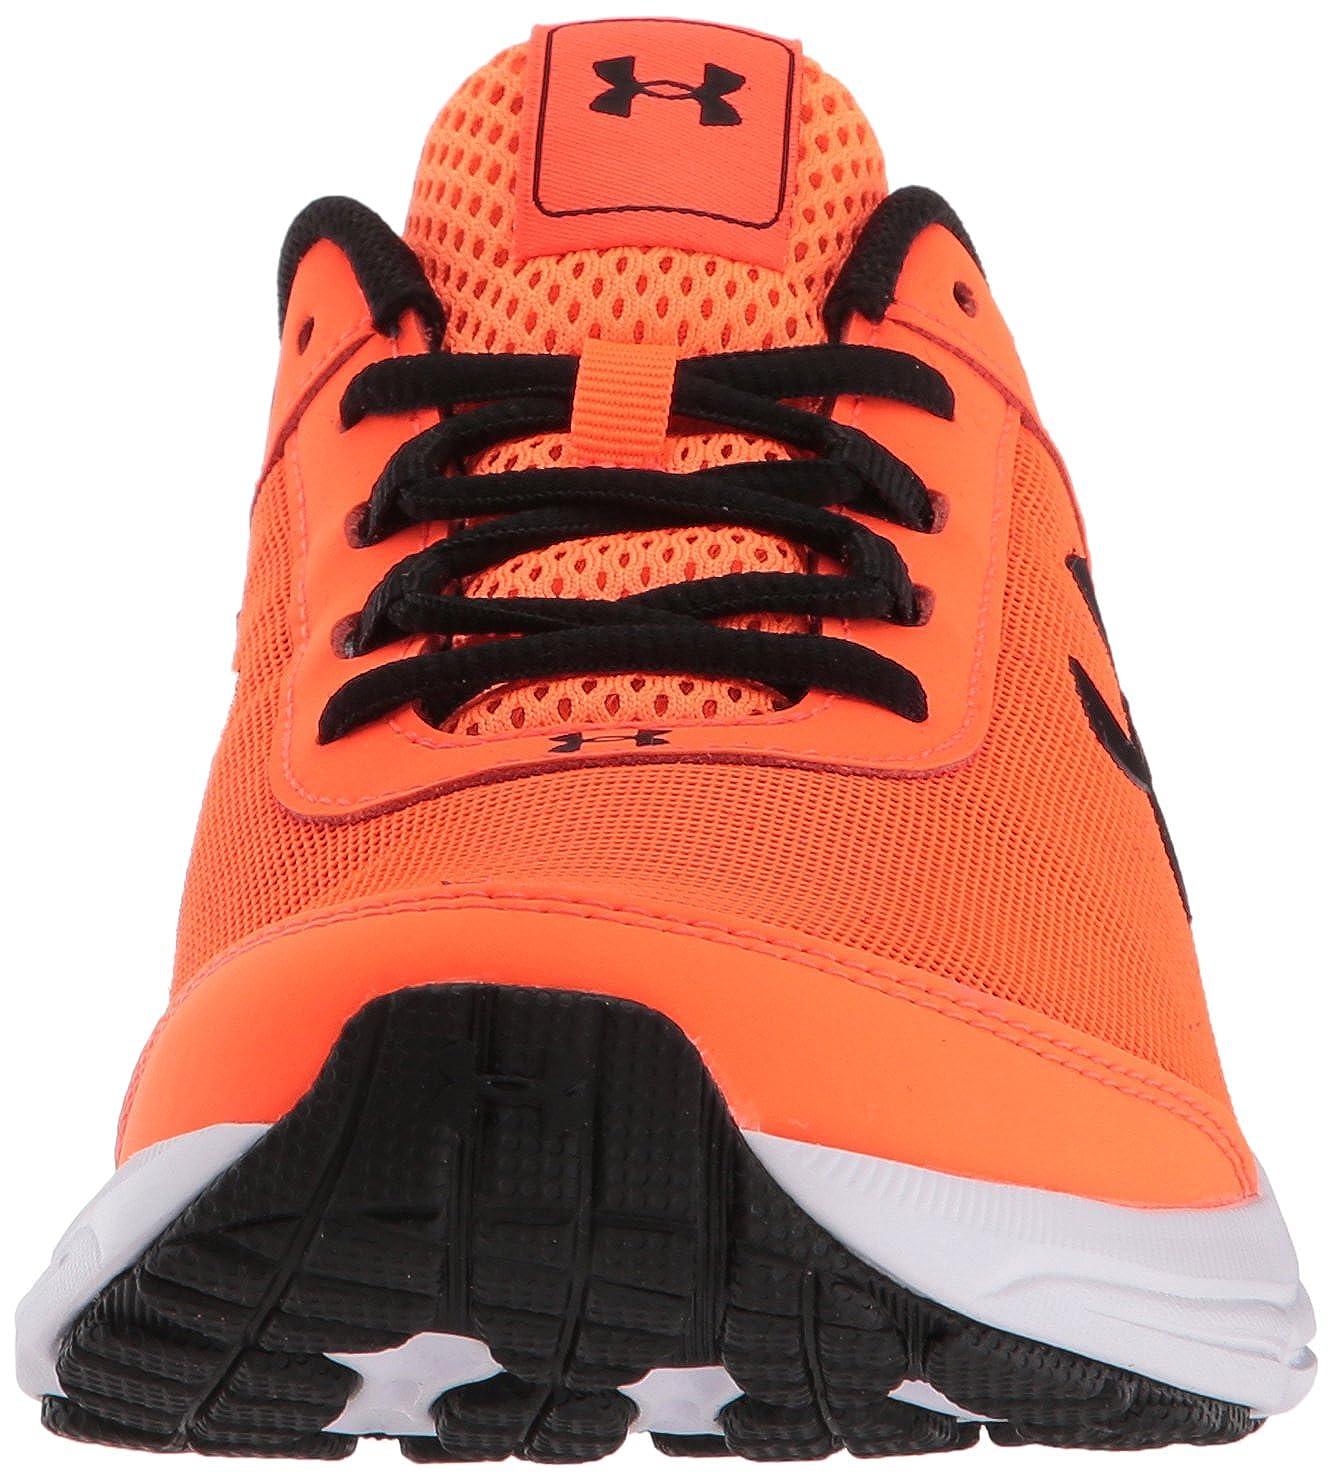 Under Armour Kids Boys Grade School Rave 2 Sneaker Under Armour Kids/' Boys/' Grade School Rave 2 Sneaker 3000141